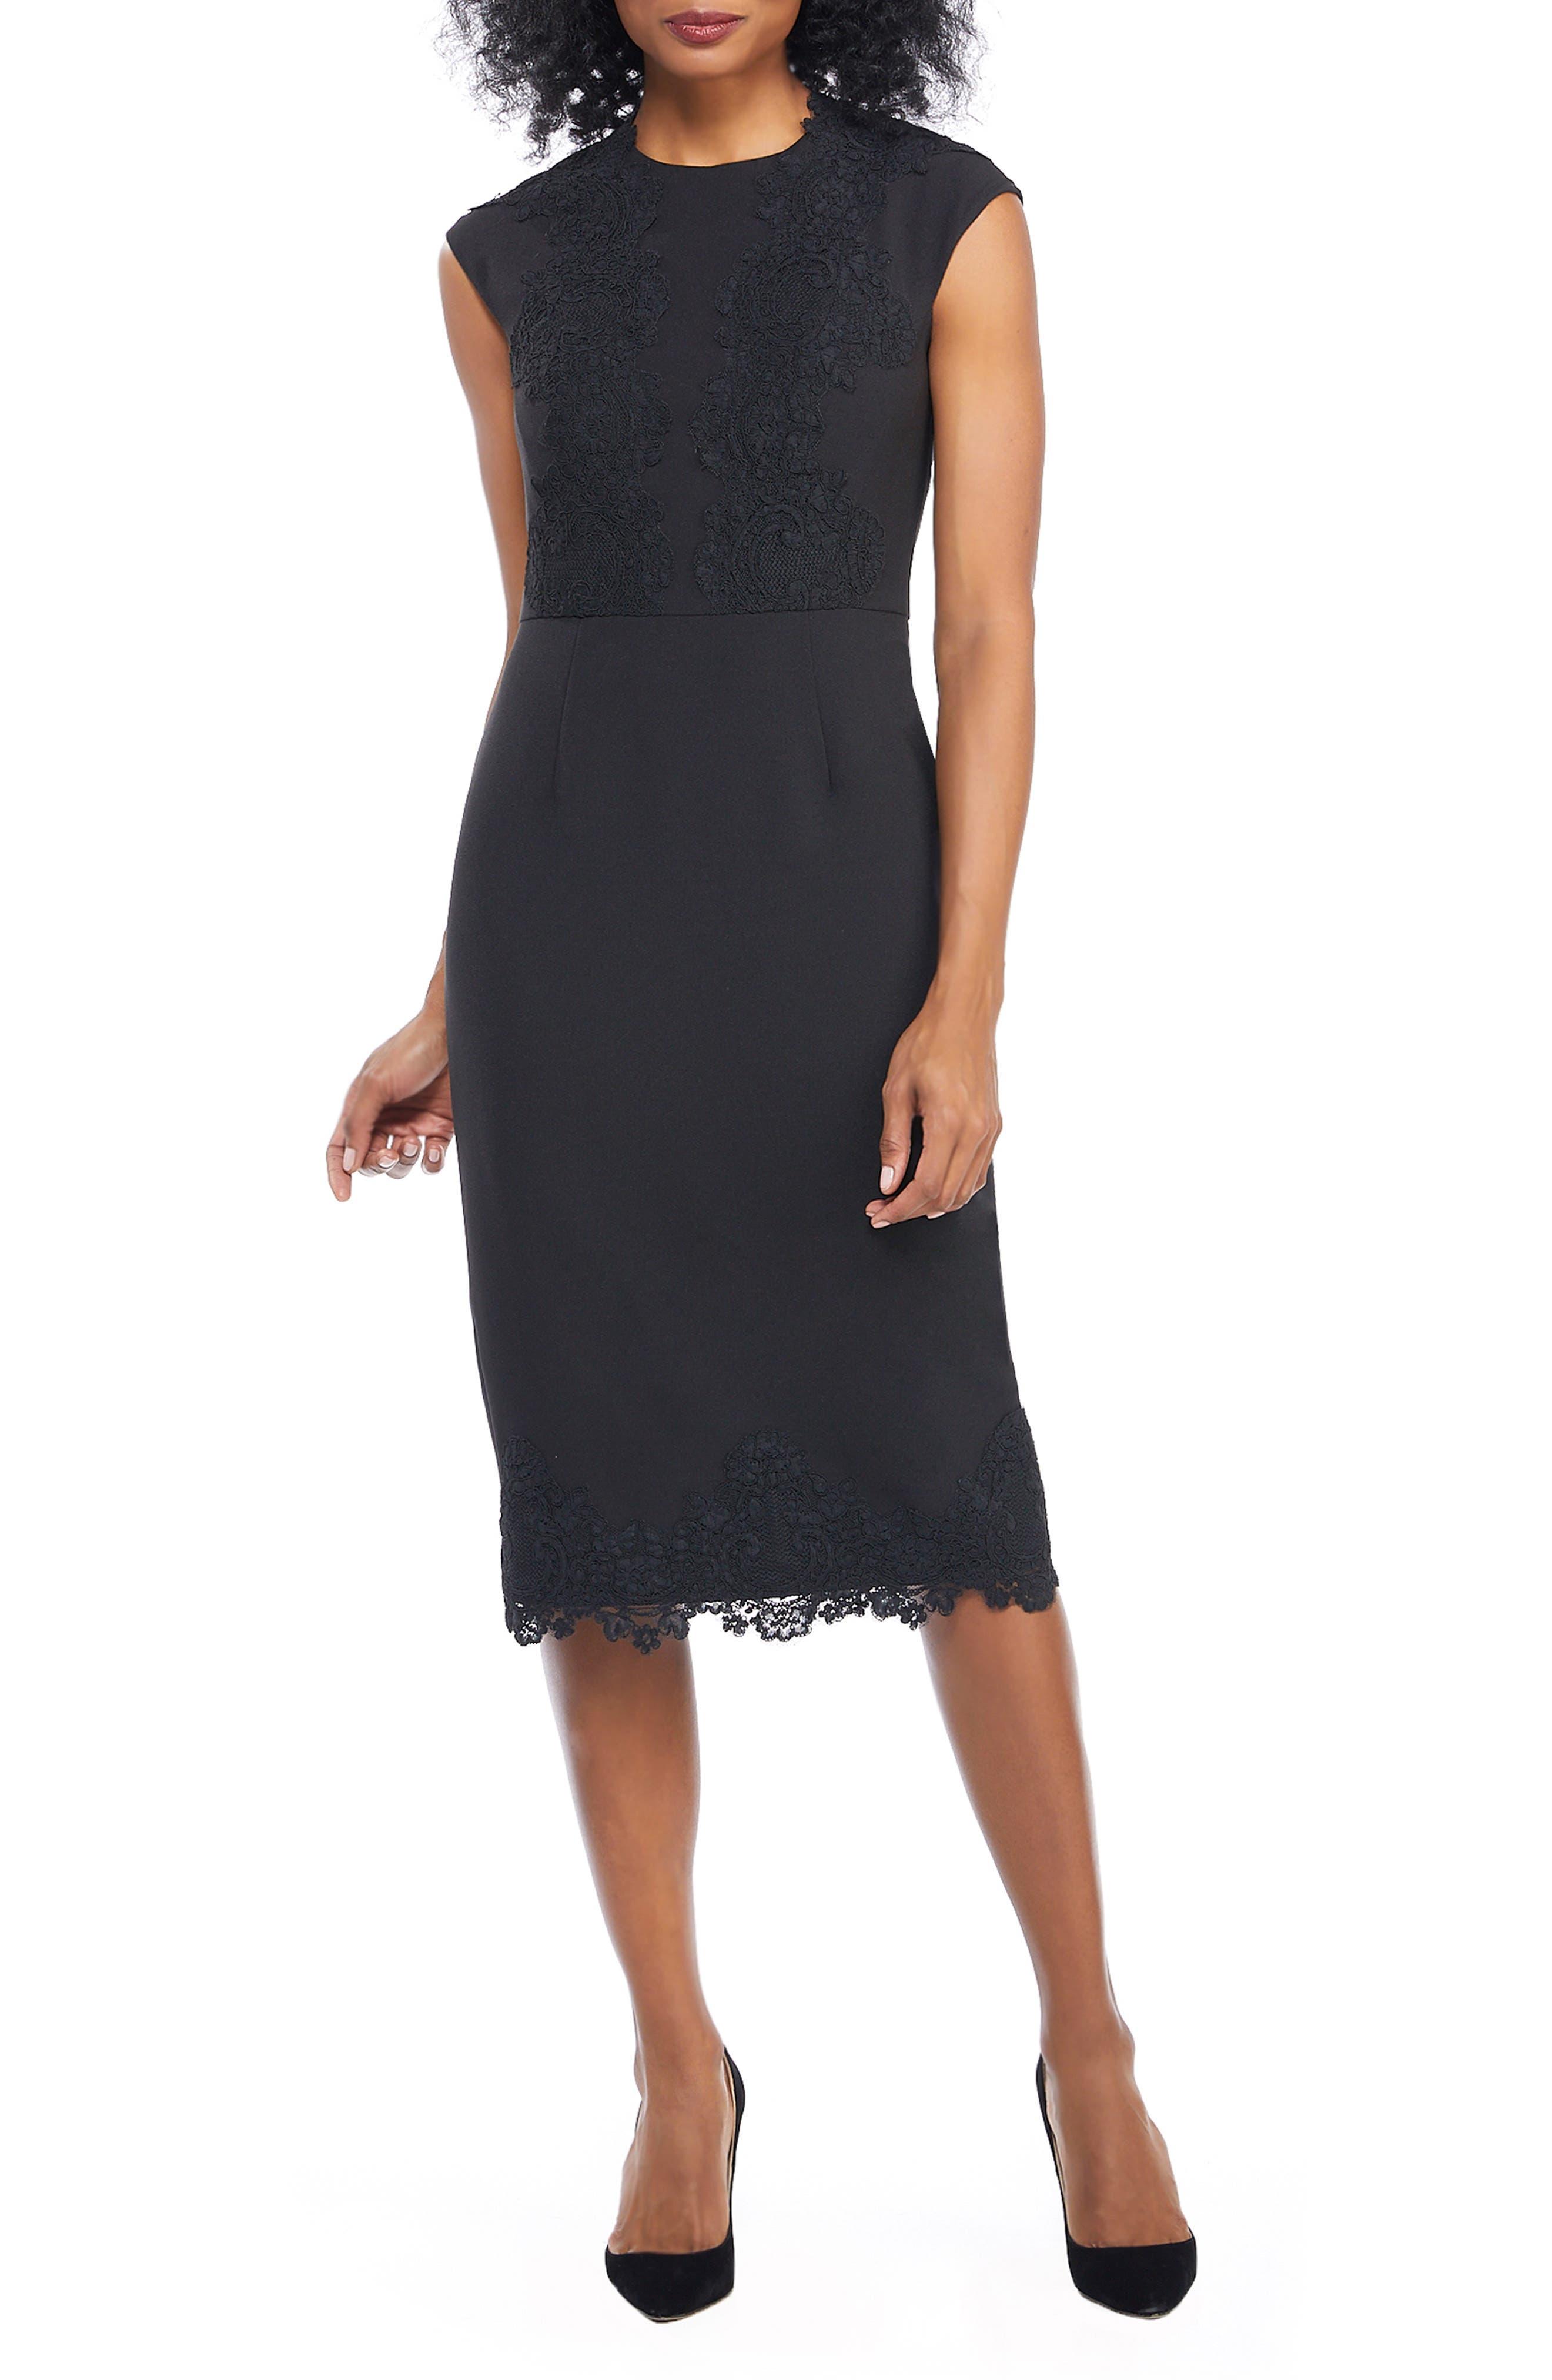 Petite Maggy London Mystic Crepe & Lace Midi Dress, Black